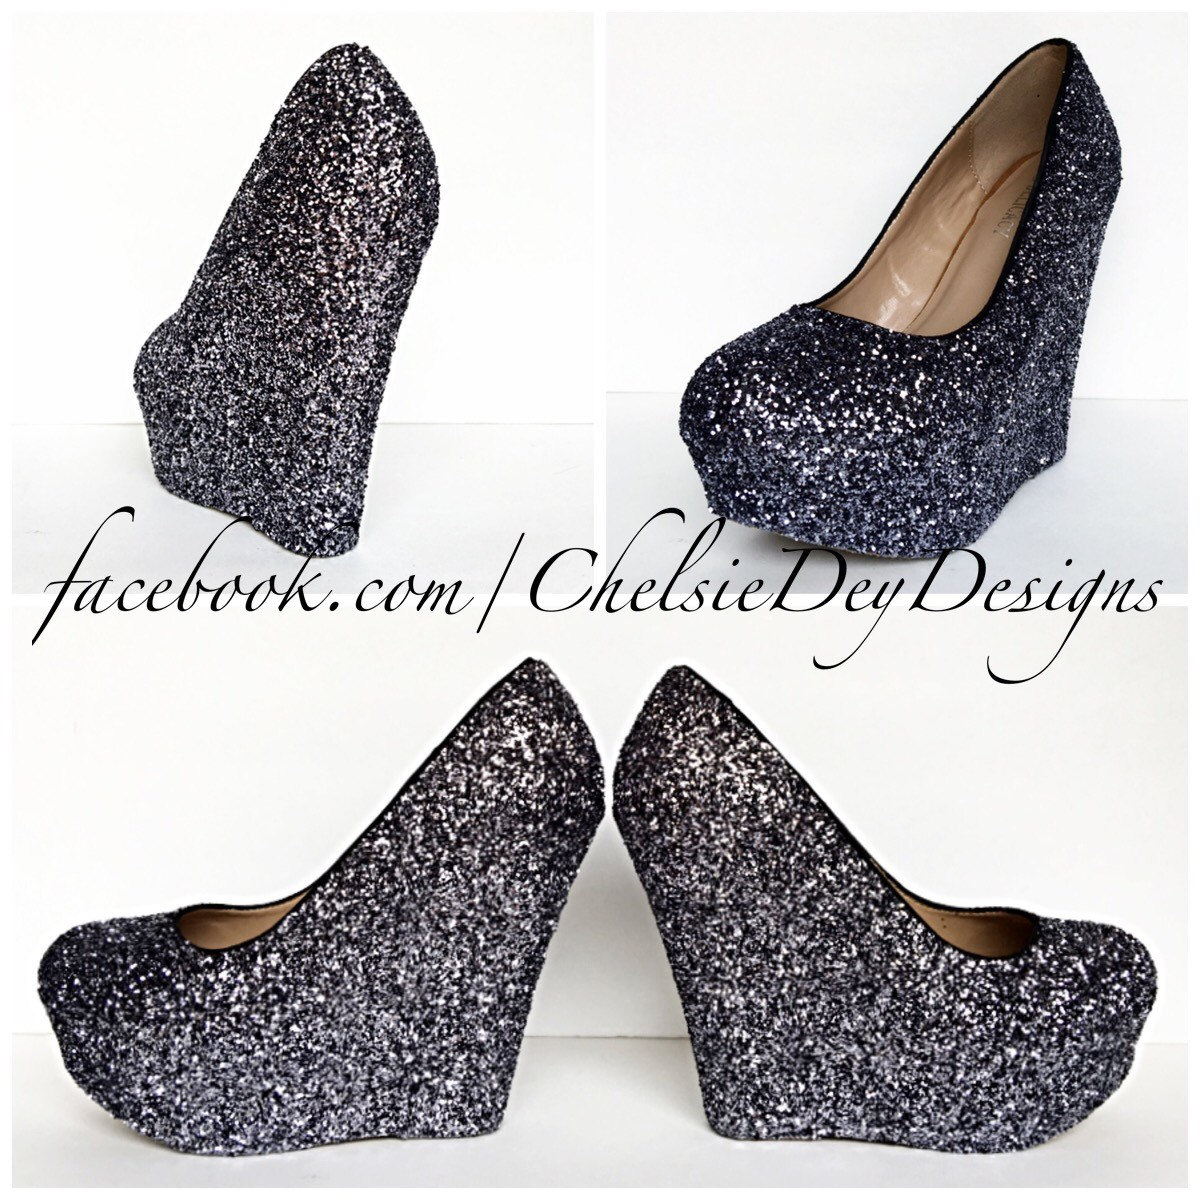 Gunmetal Glitter Wedges - Sparkly Charcoal Dark Grey Gray Platform ... bb545f507